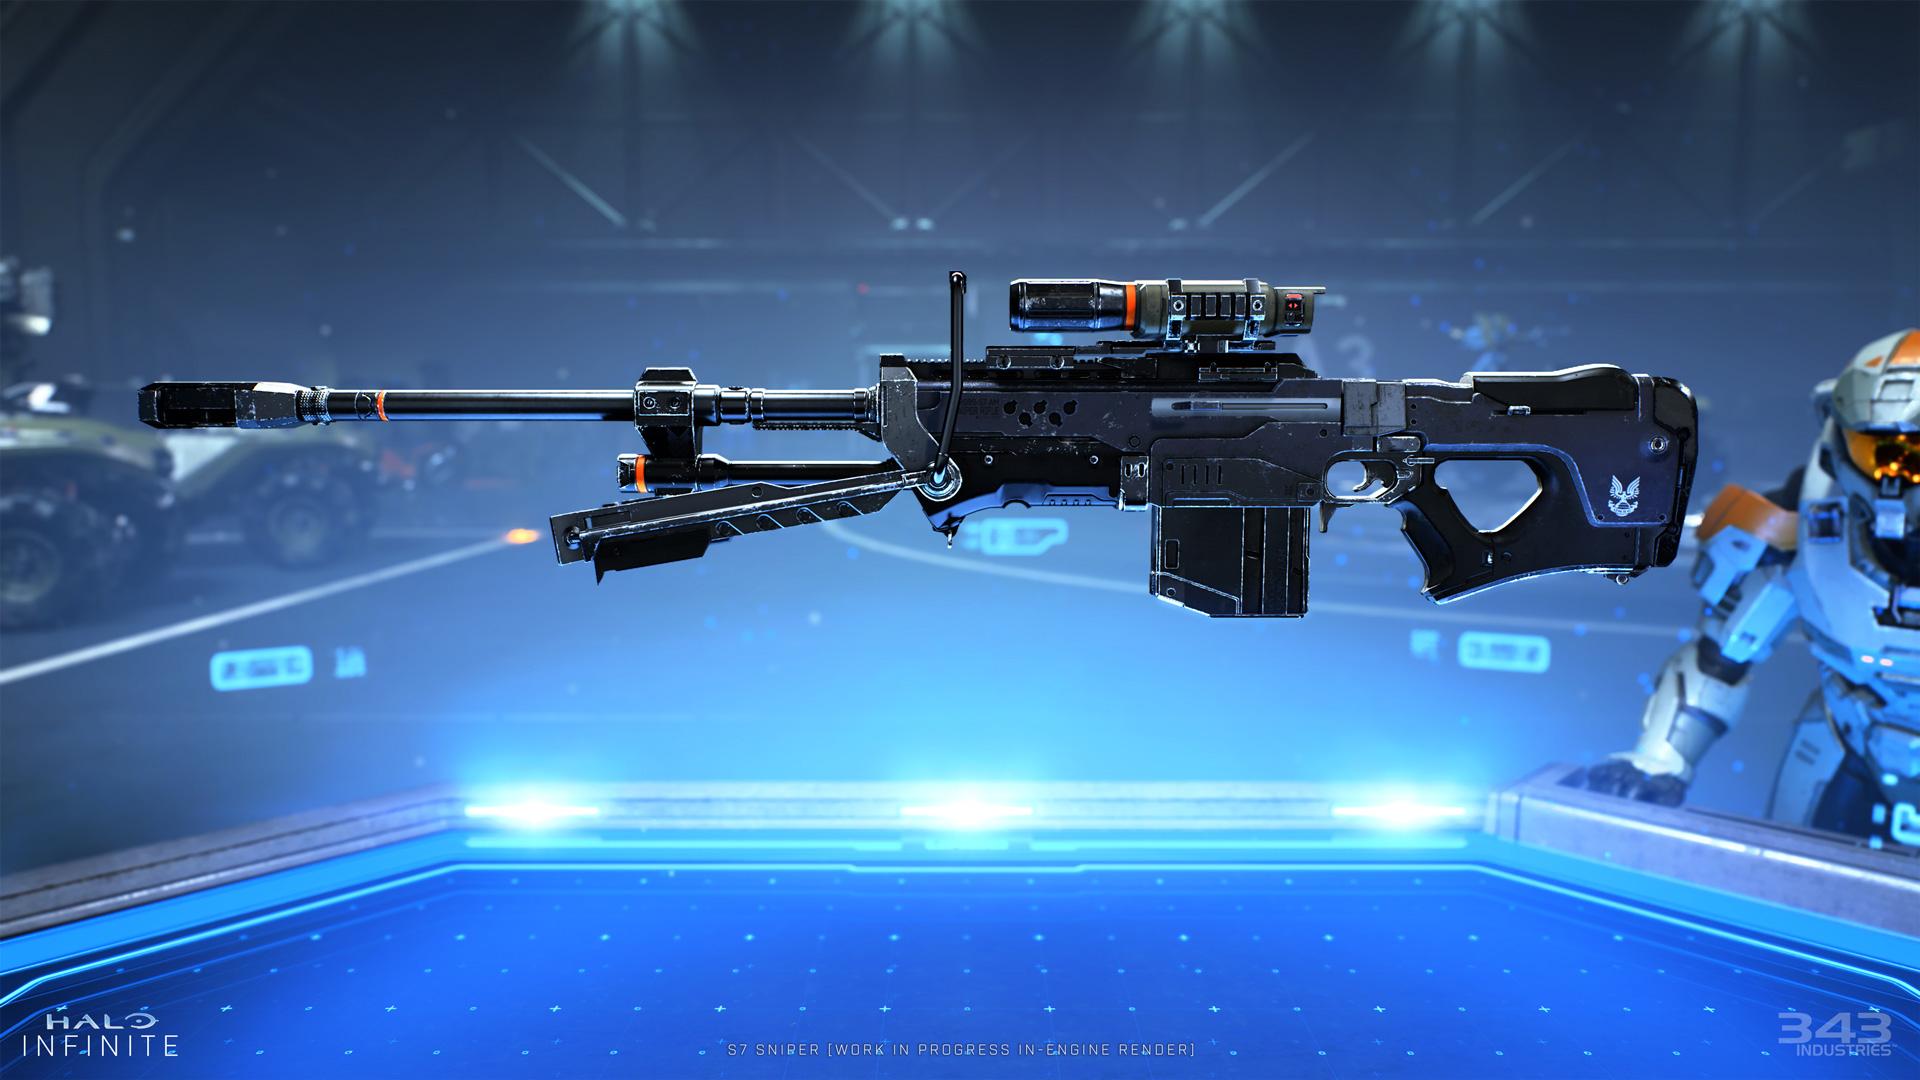 Halo Infinite gun render